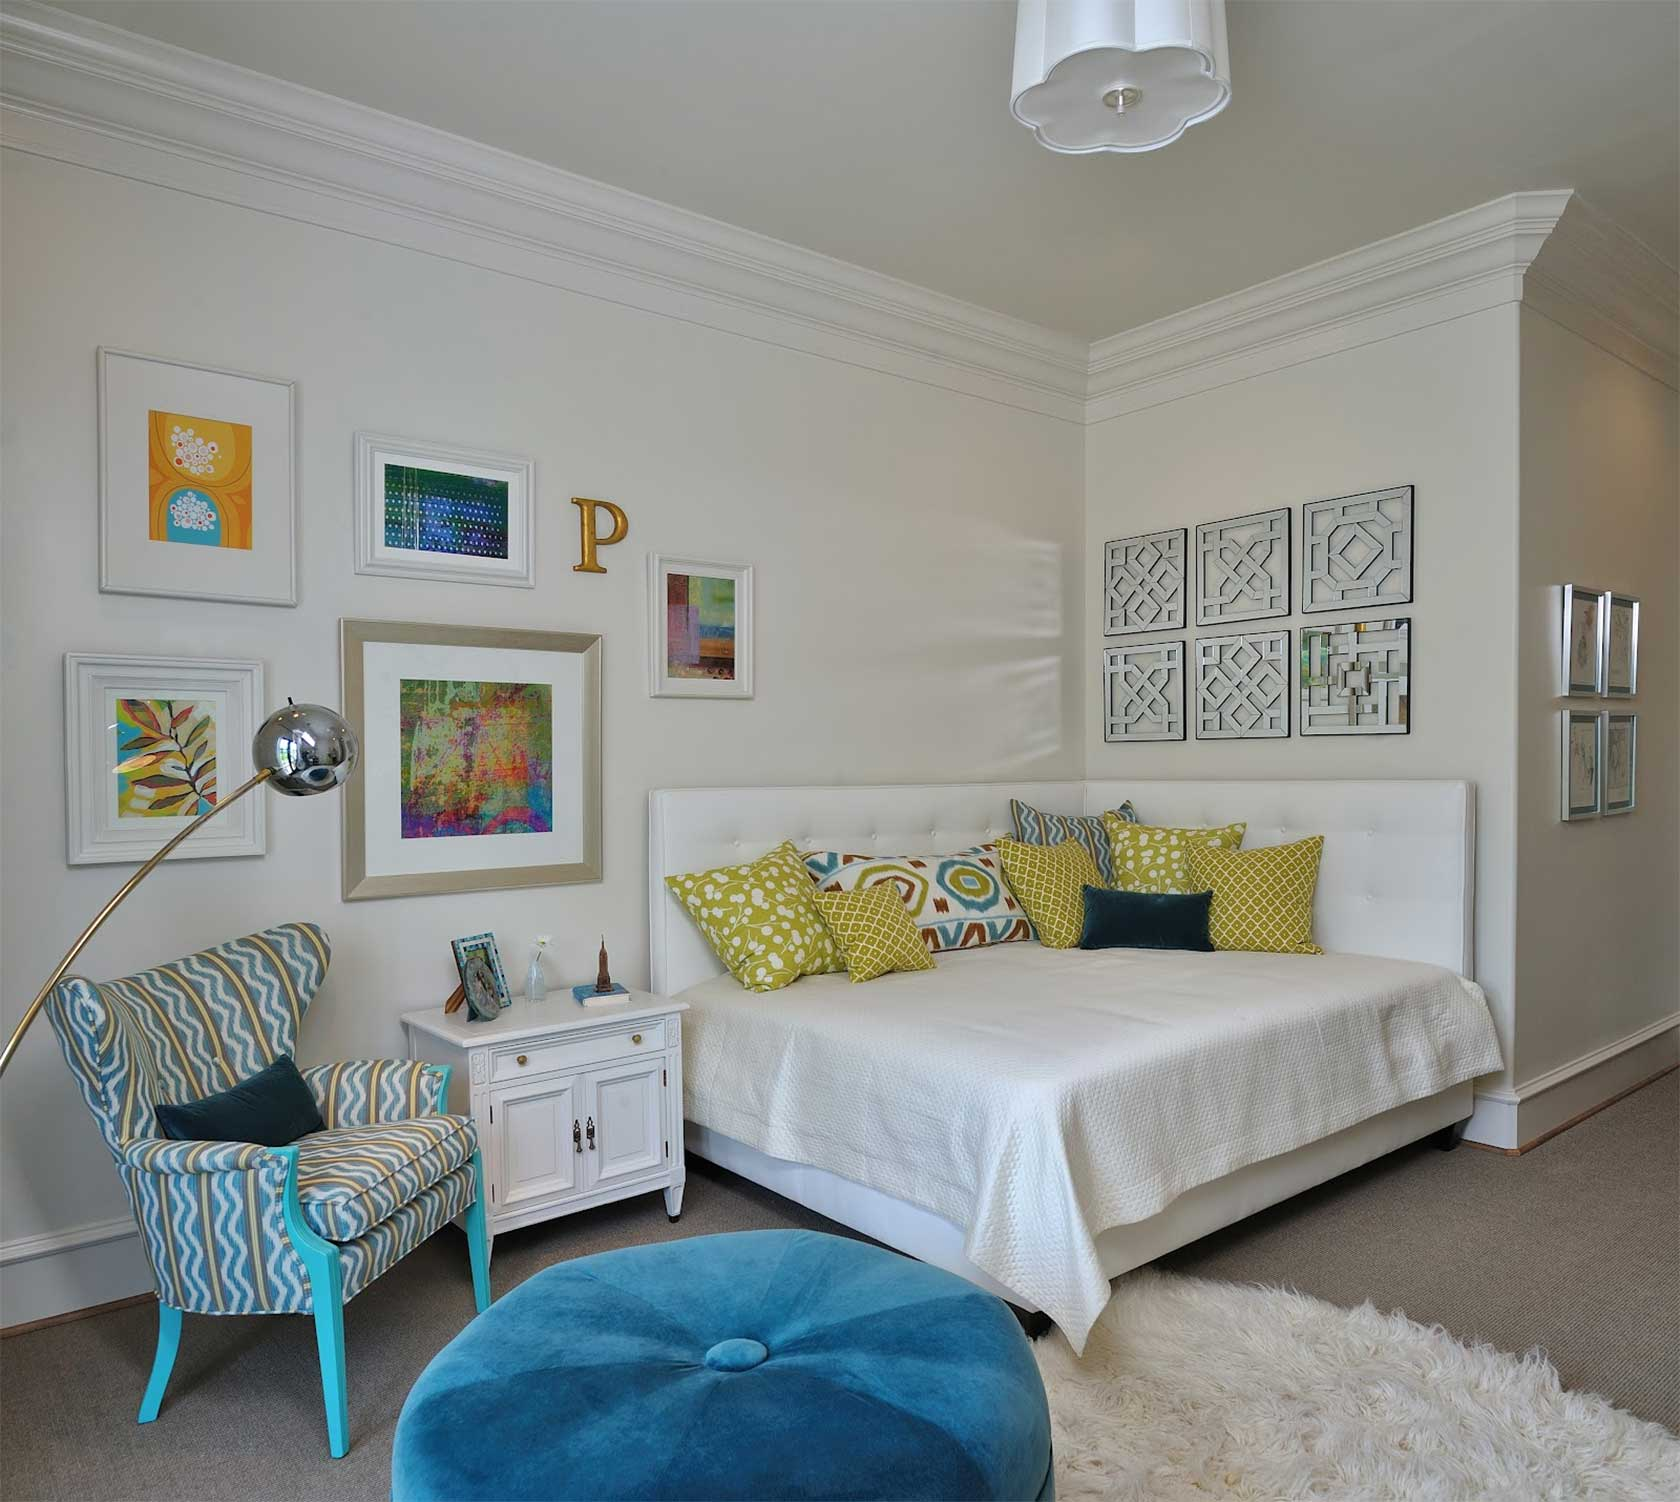 Cute Couples Apartment: Inspiring decorating apartment pictures ...